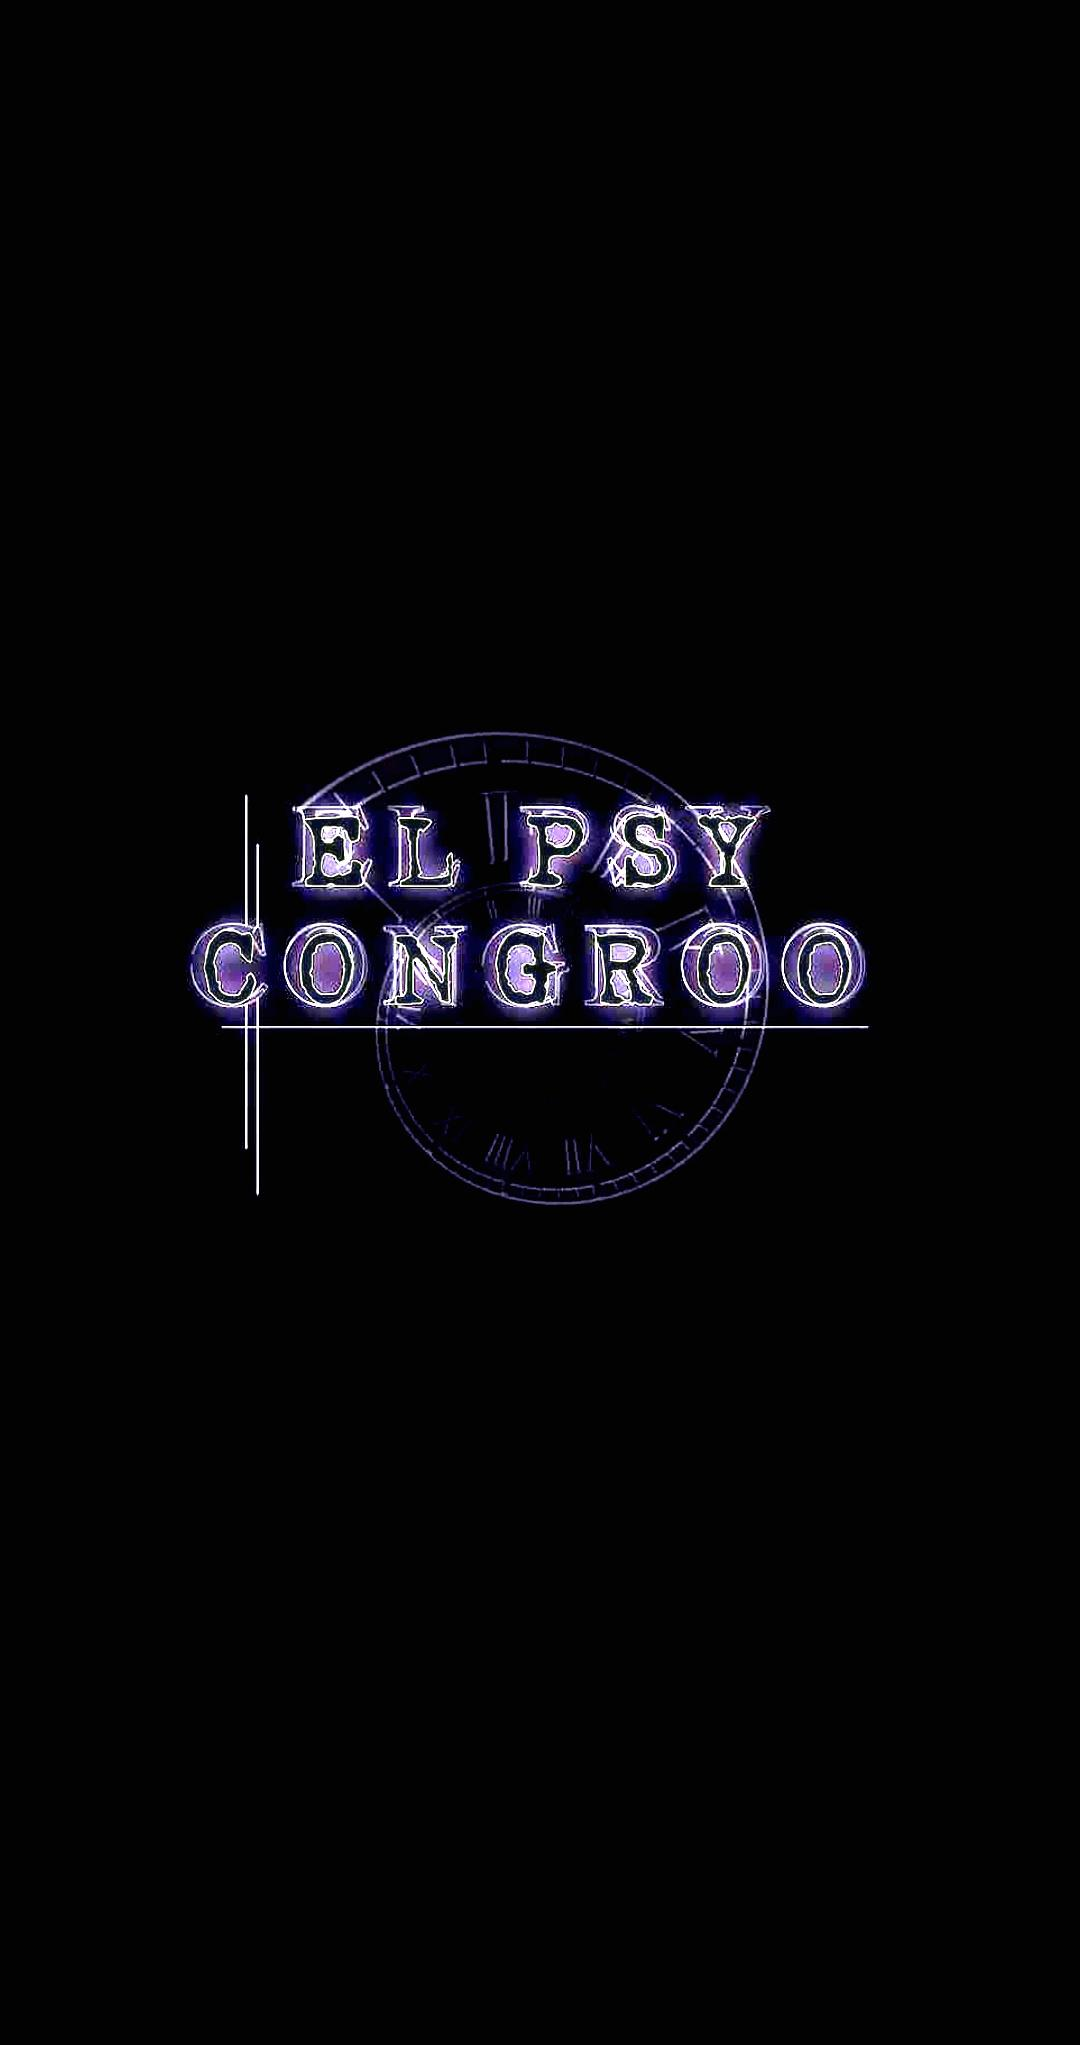 El Psy Congroo : congroo, Congroo, Steinsgate